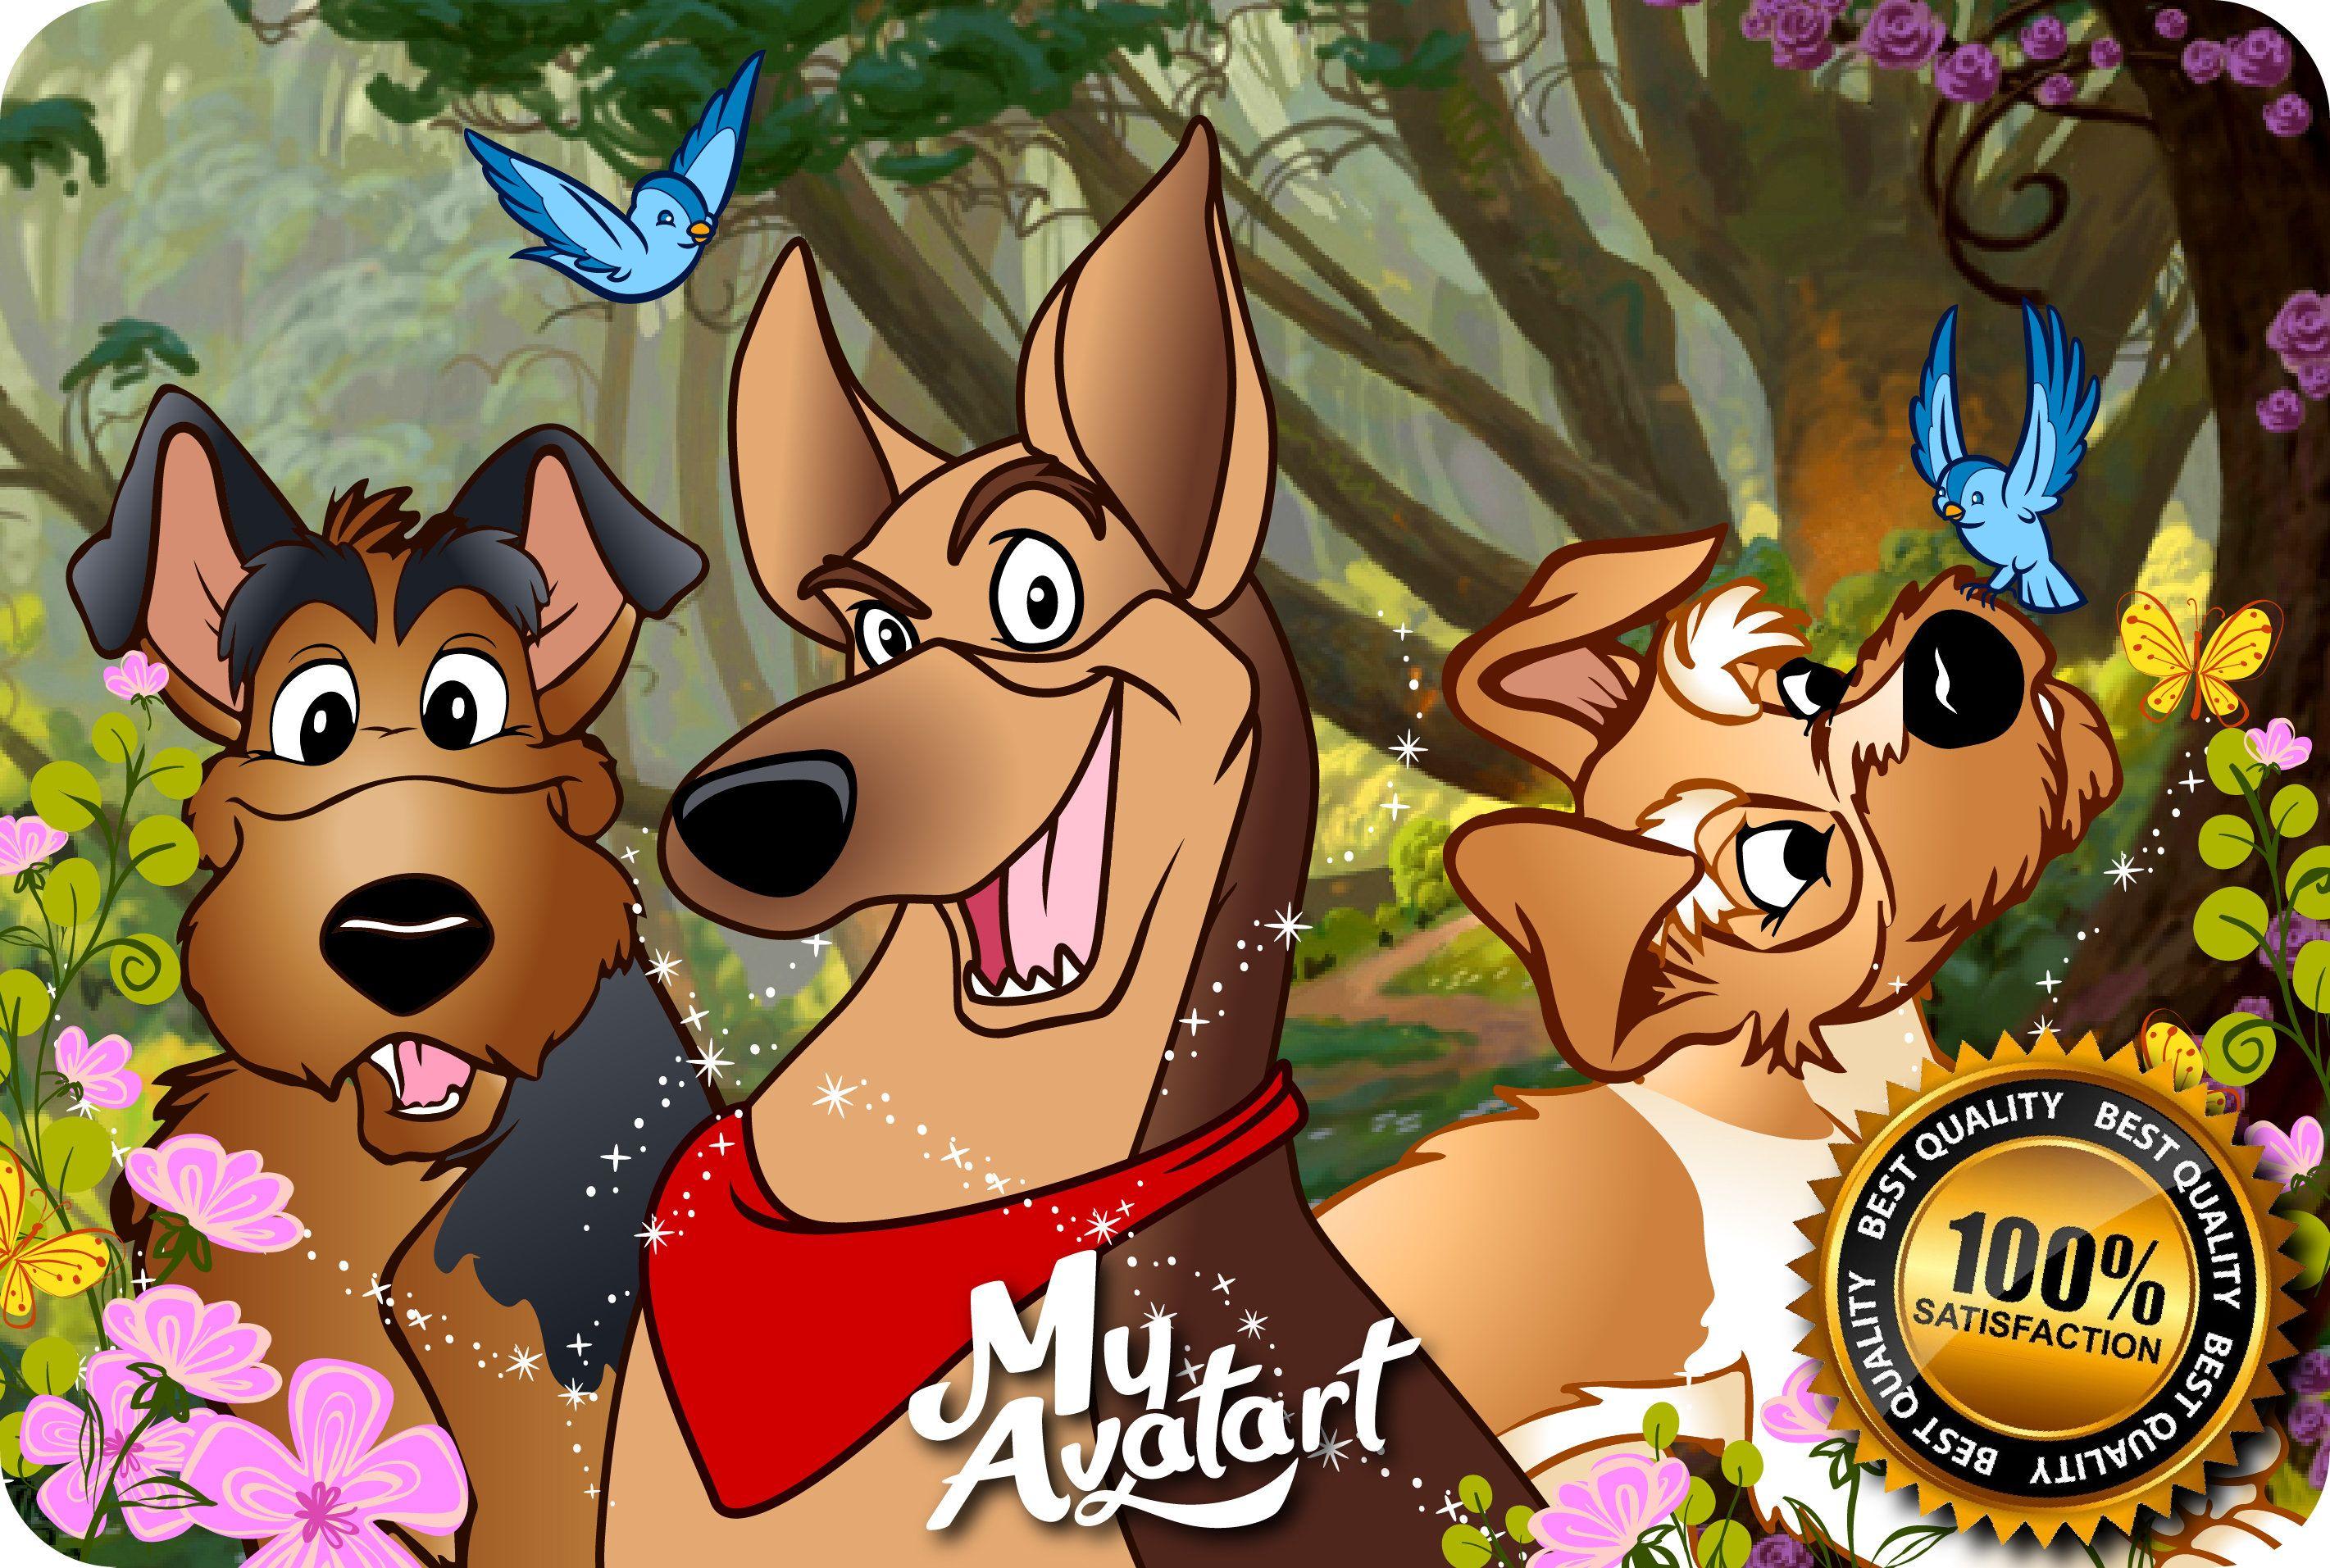 Personalized Cartoon Of Your Dog Disney Dog Cartoon Dog Etsy In 2020 Disney Drawings Animal Drawings Person Cartoon